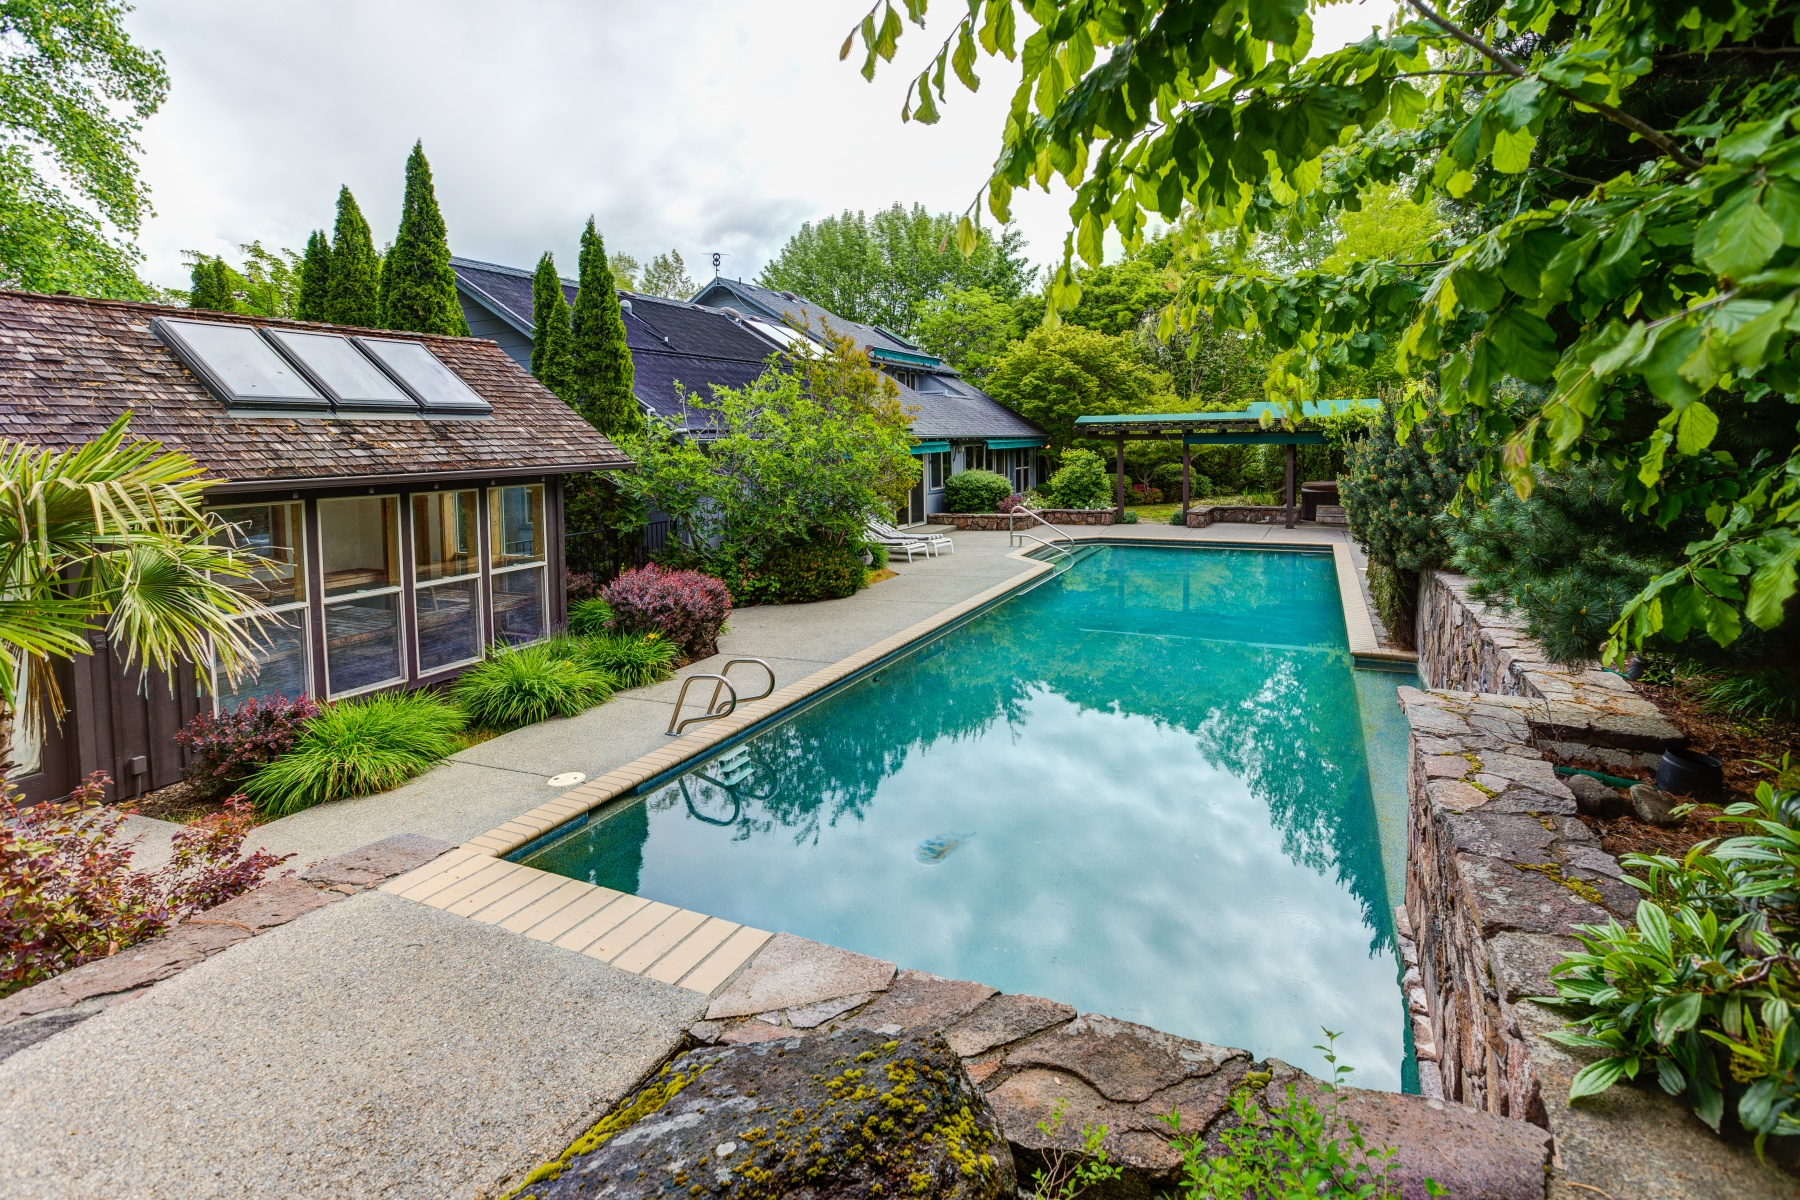 Single Family Home for Sale at 1365 Tolman Creek Ashland, Oregon 97520 United States